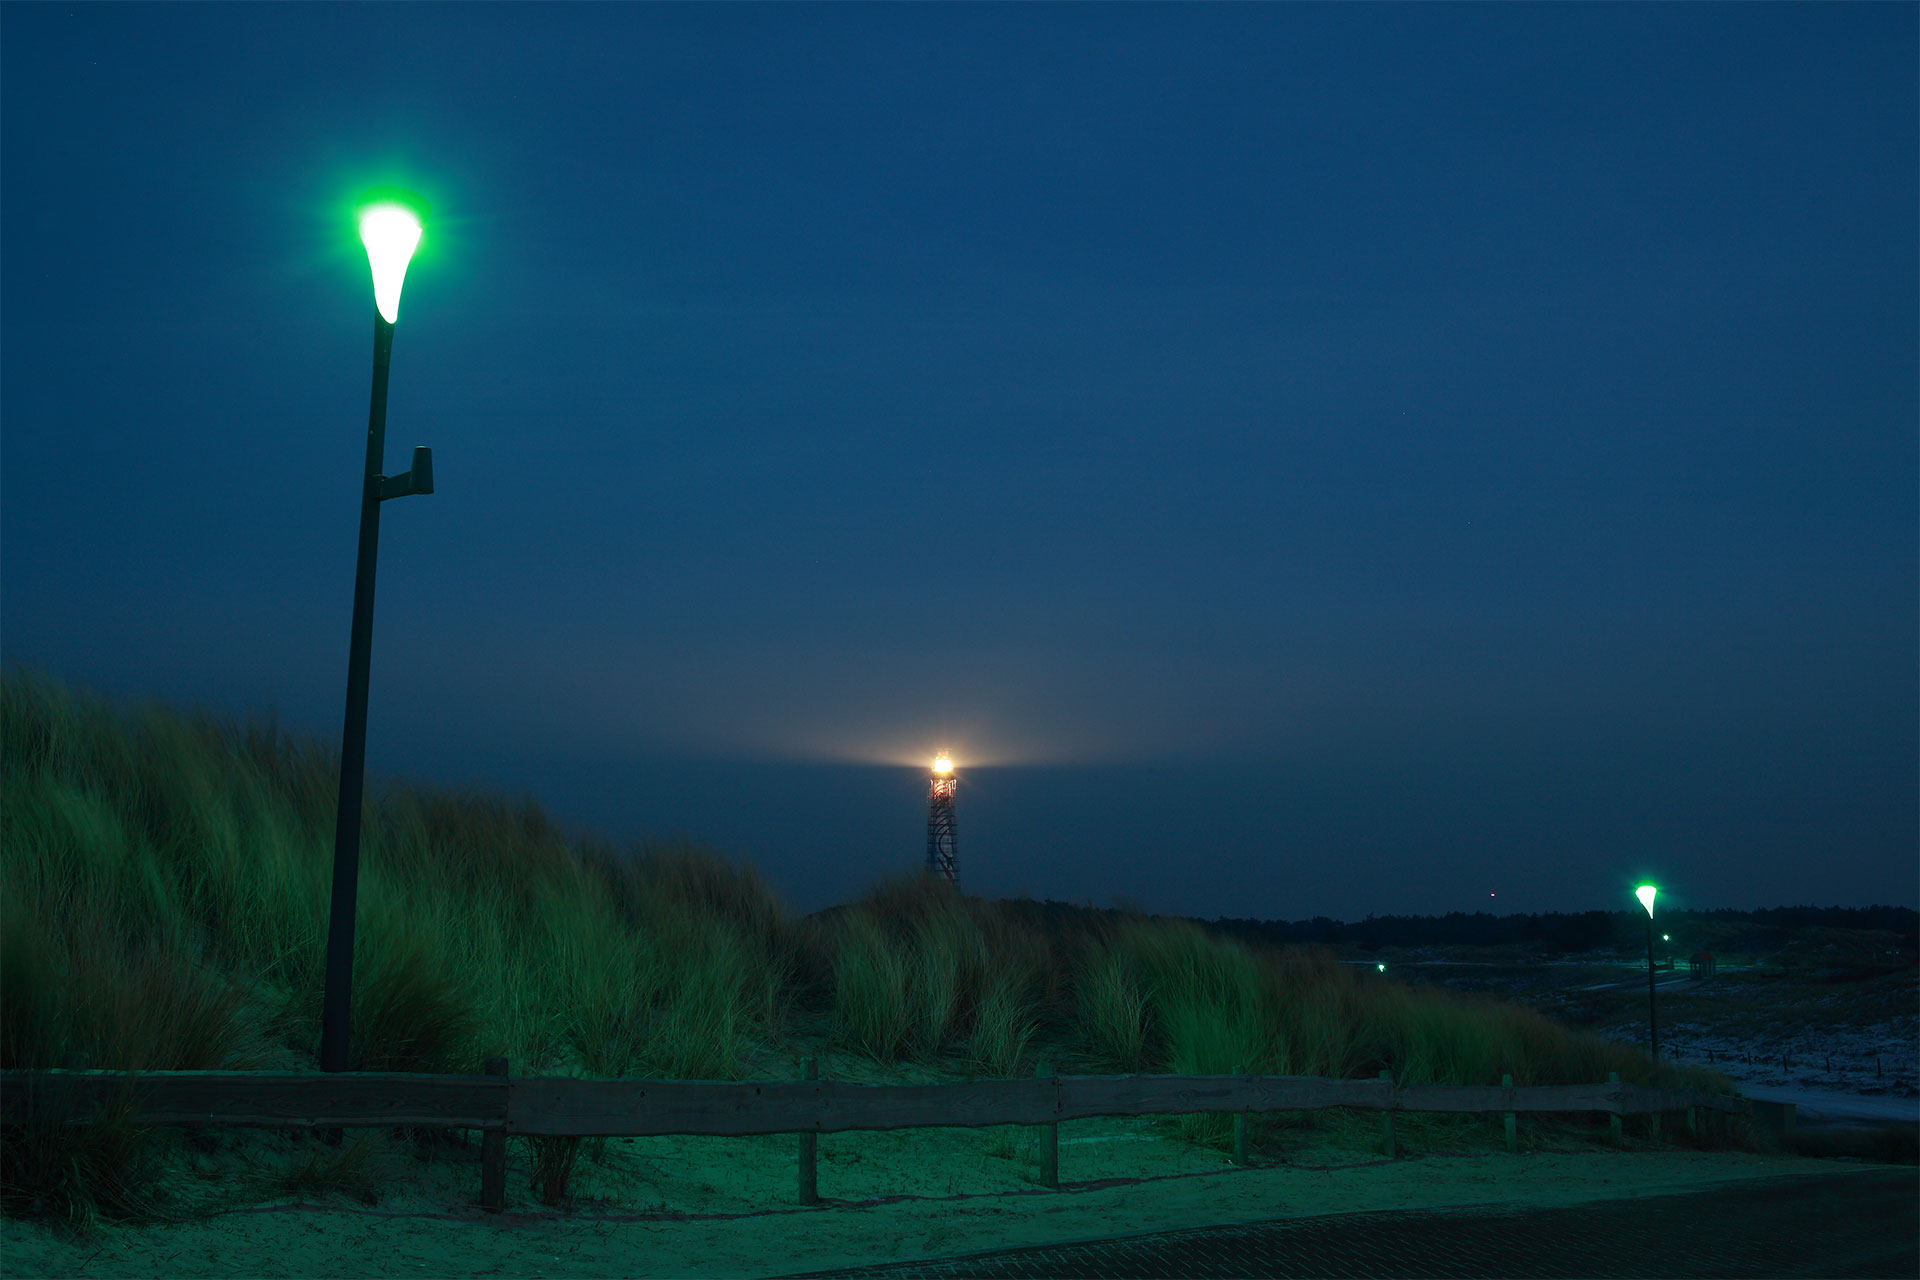 Philips strandverlichting Ameland